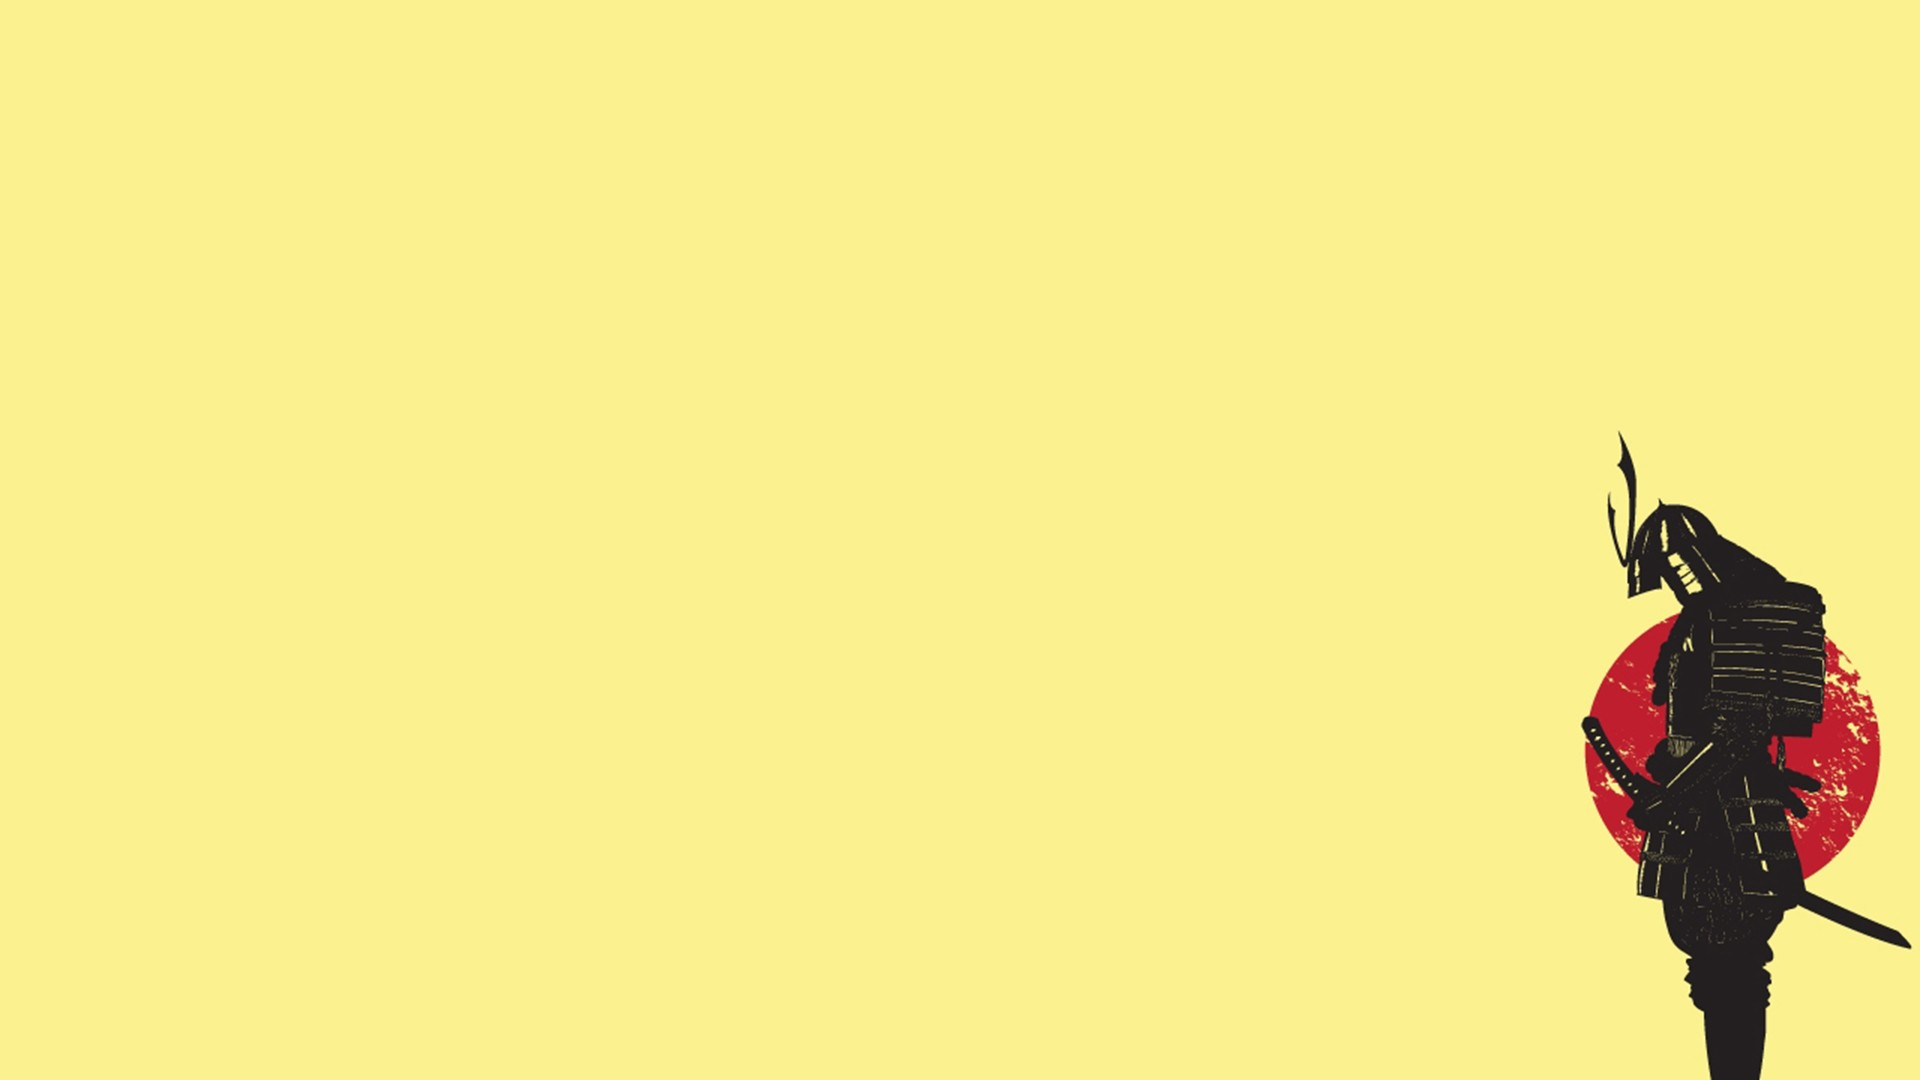 Sunset Japan Minimalistic Yellow Samurai Funny Wallpaper 1920x1080 216994 Wallpaperup